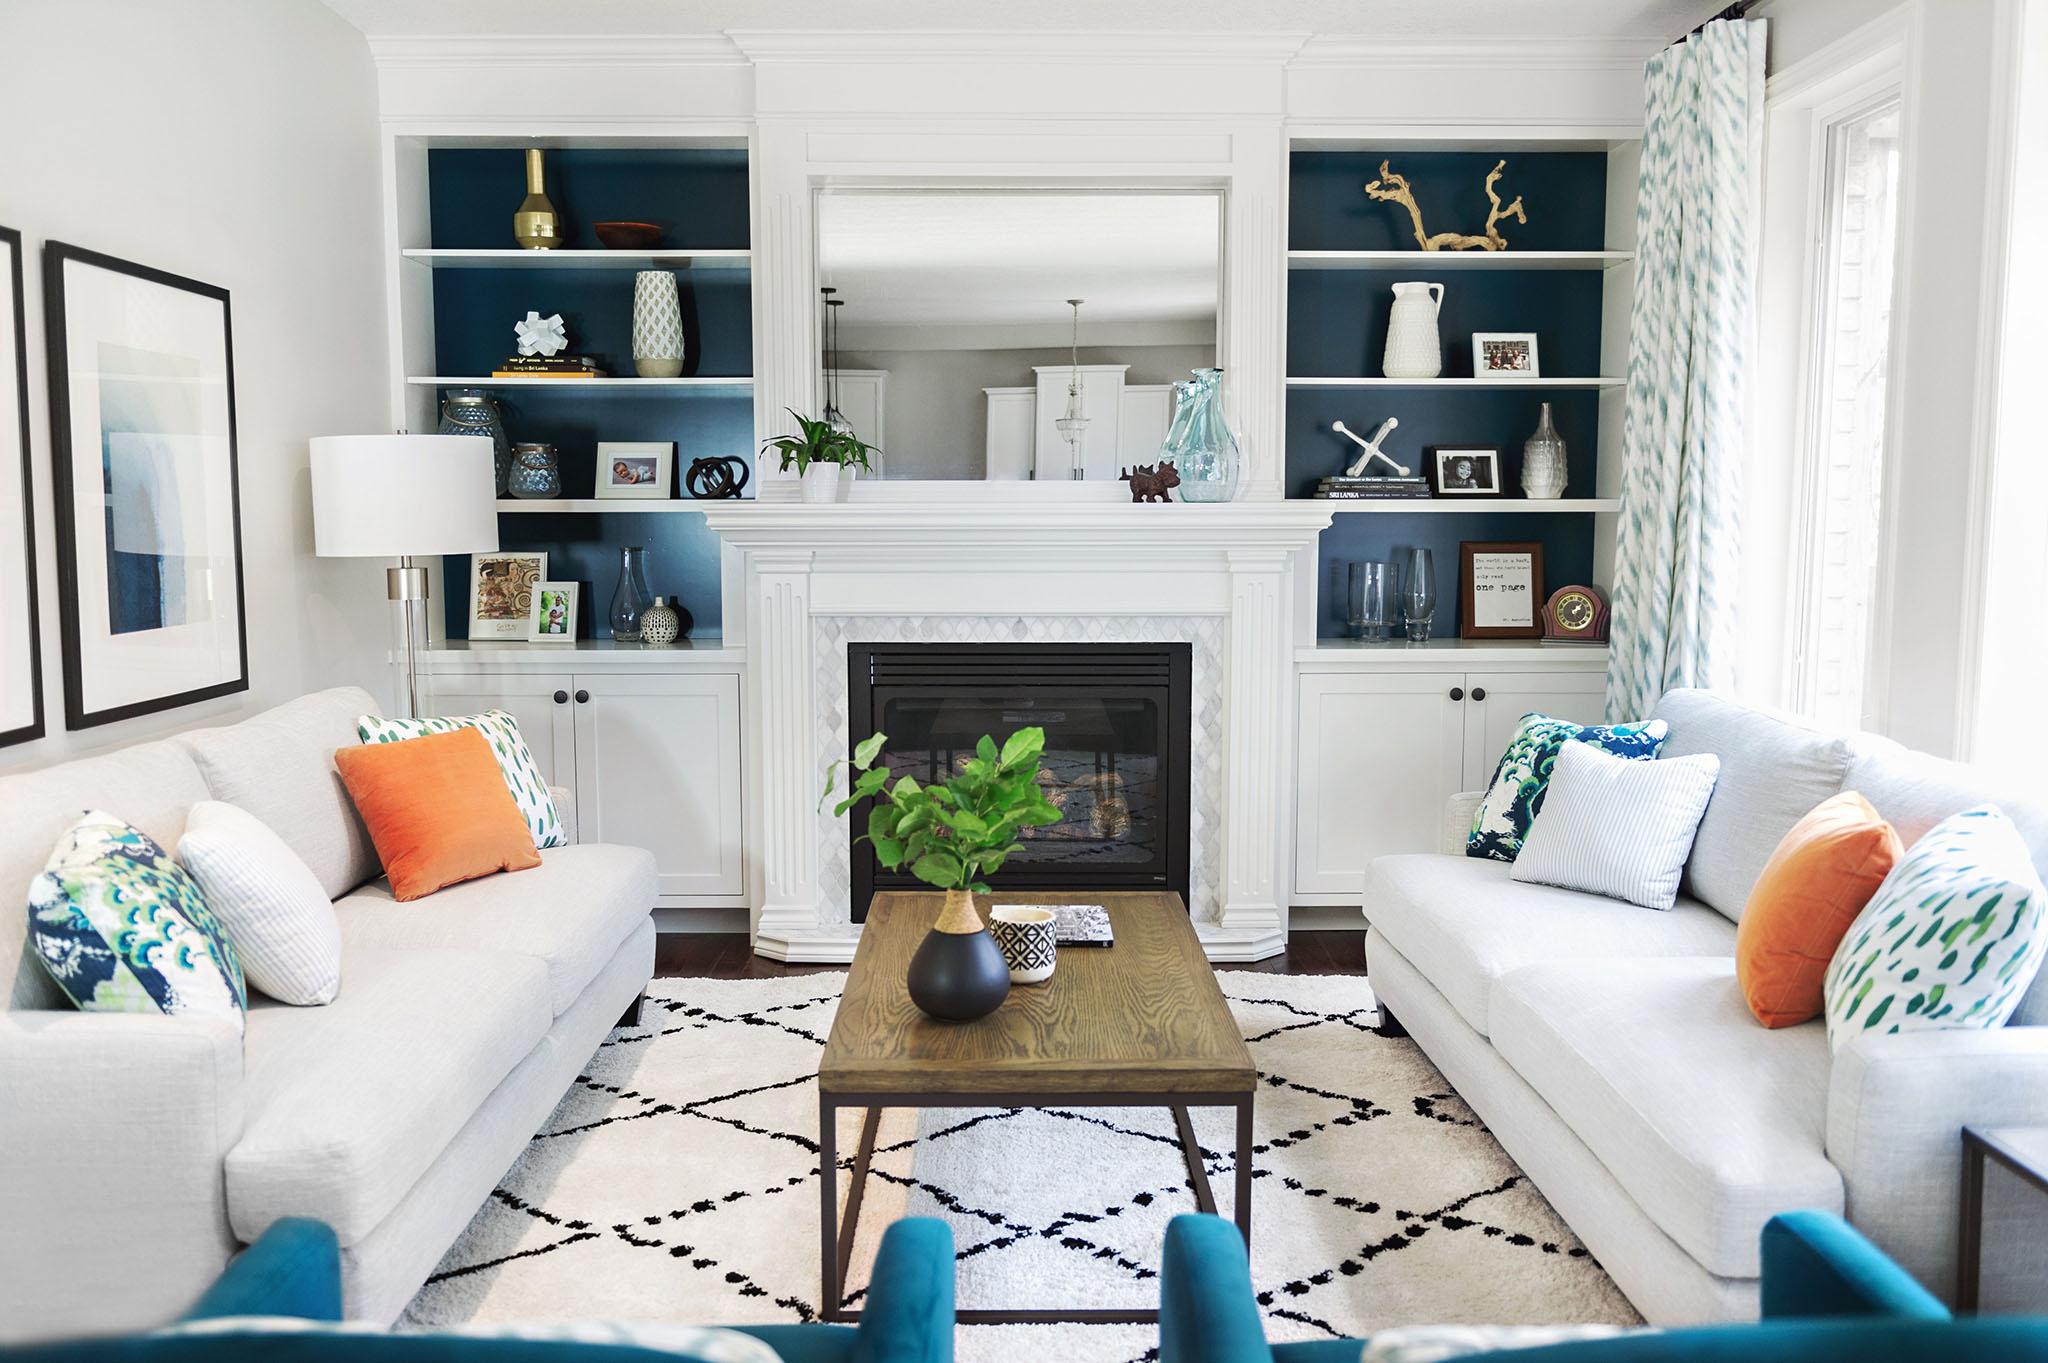 buttercup design home buttercup design. Black Bedroom Furniture Sets. Home Design Ideas